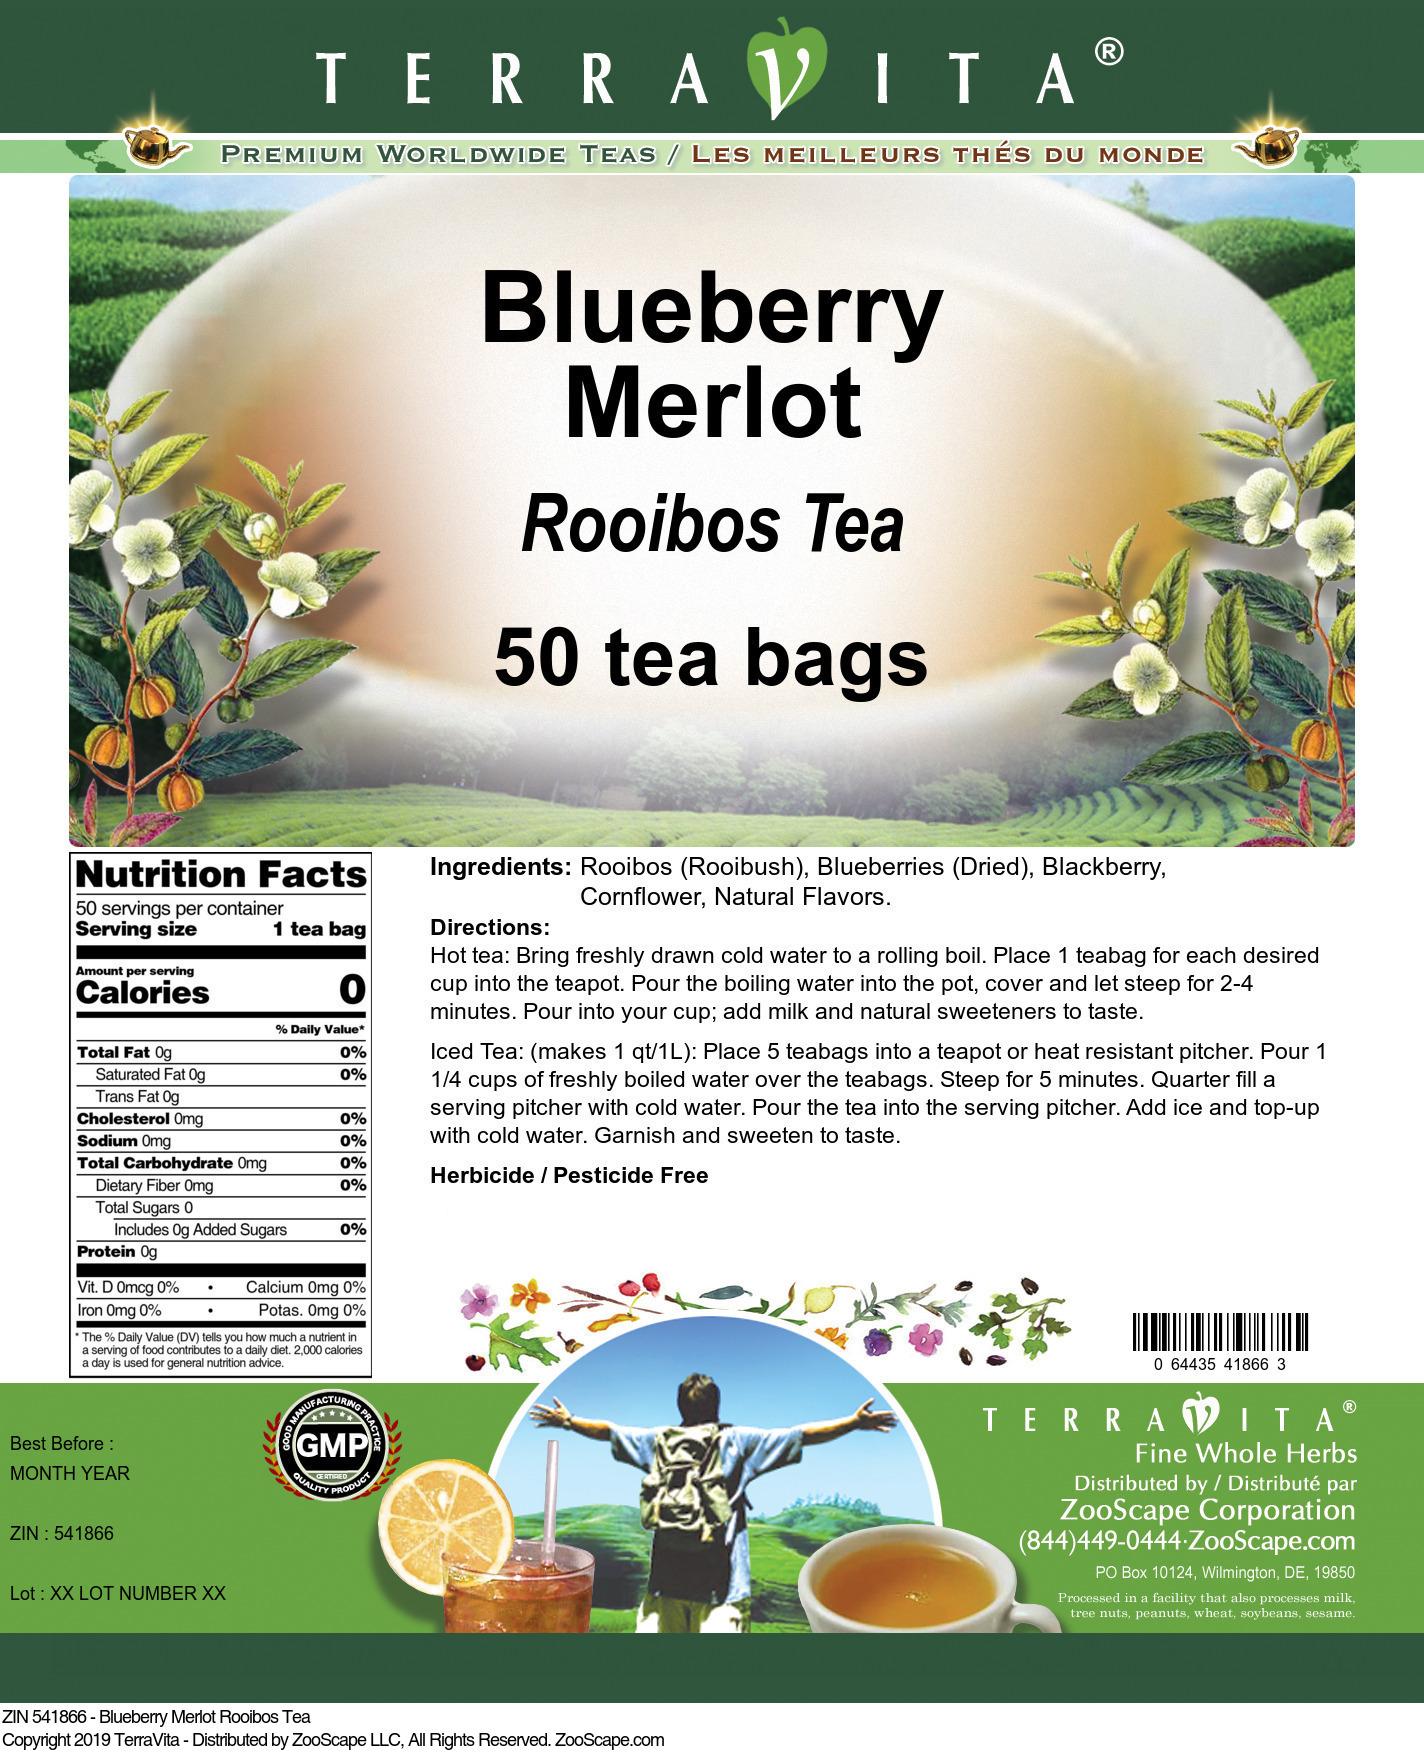 Blueberry Merlot Rooibos Tea